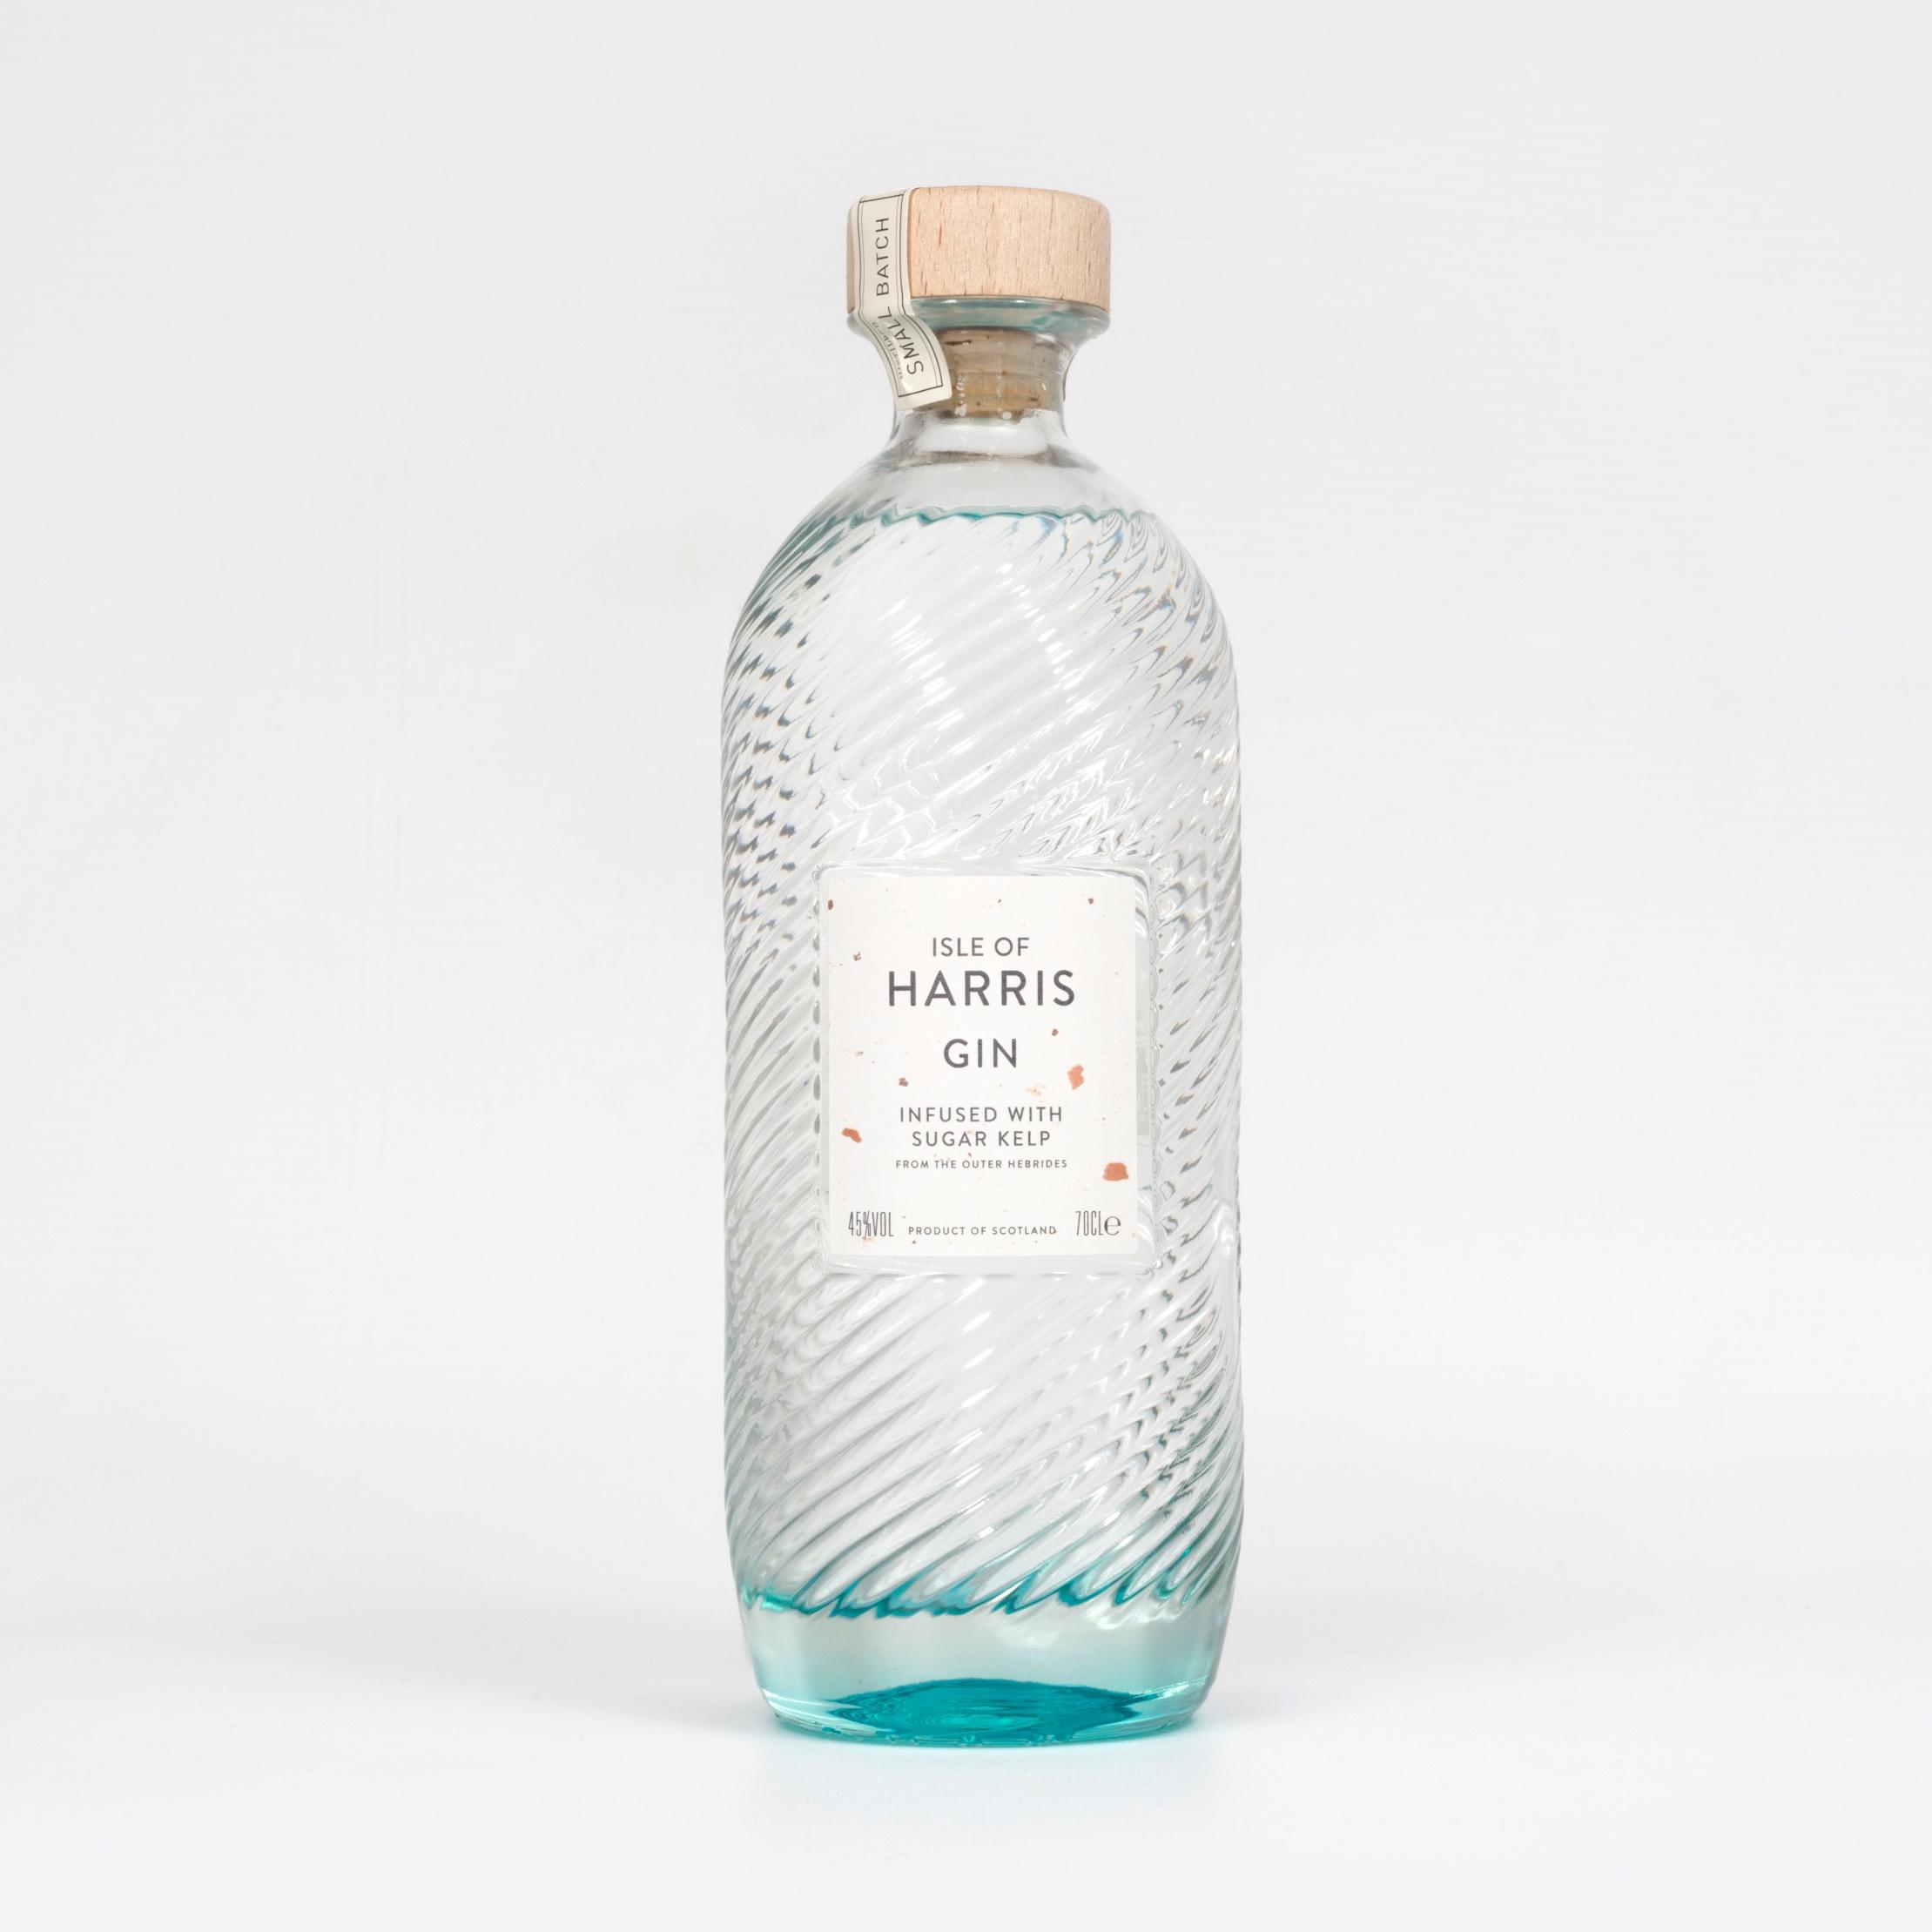 Copy of Bottle Resized 2 EDIT.jpg